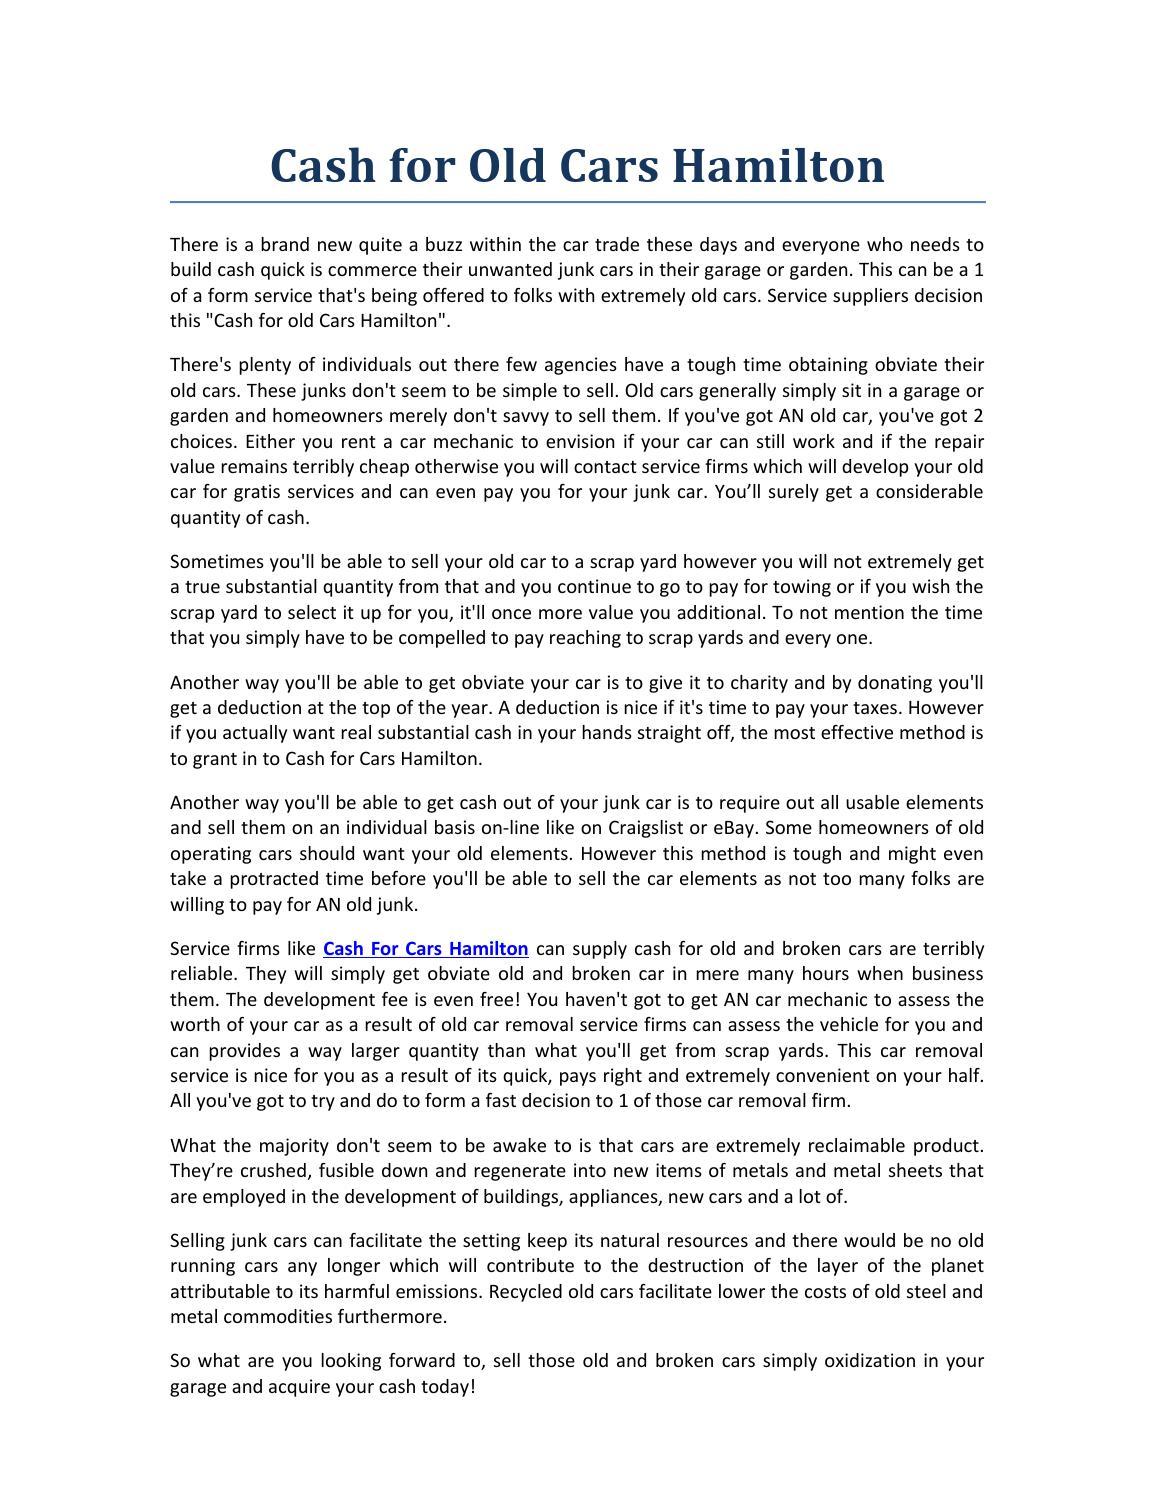 Cash for old cars hamilton 1 by rosh hamton - issuu